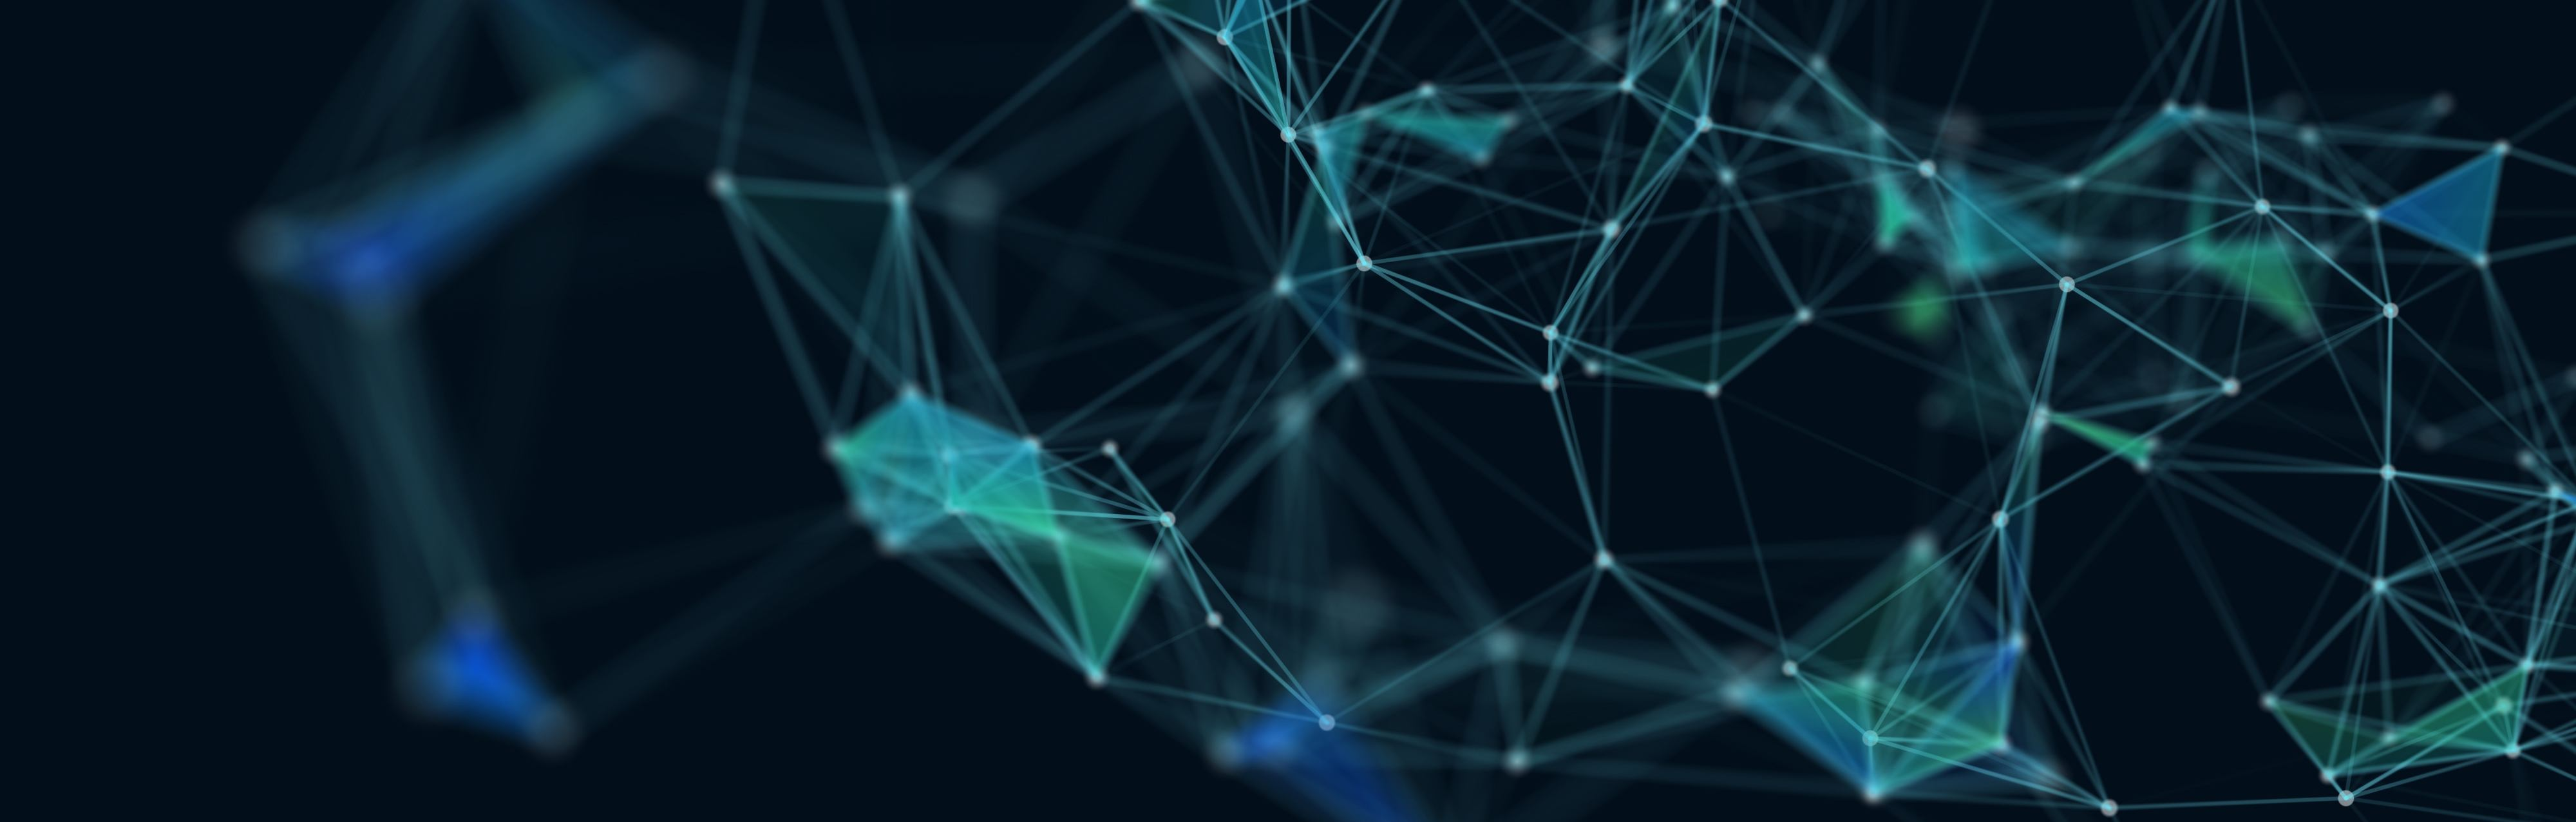 intergator network